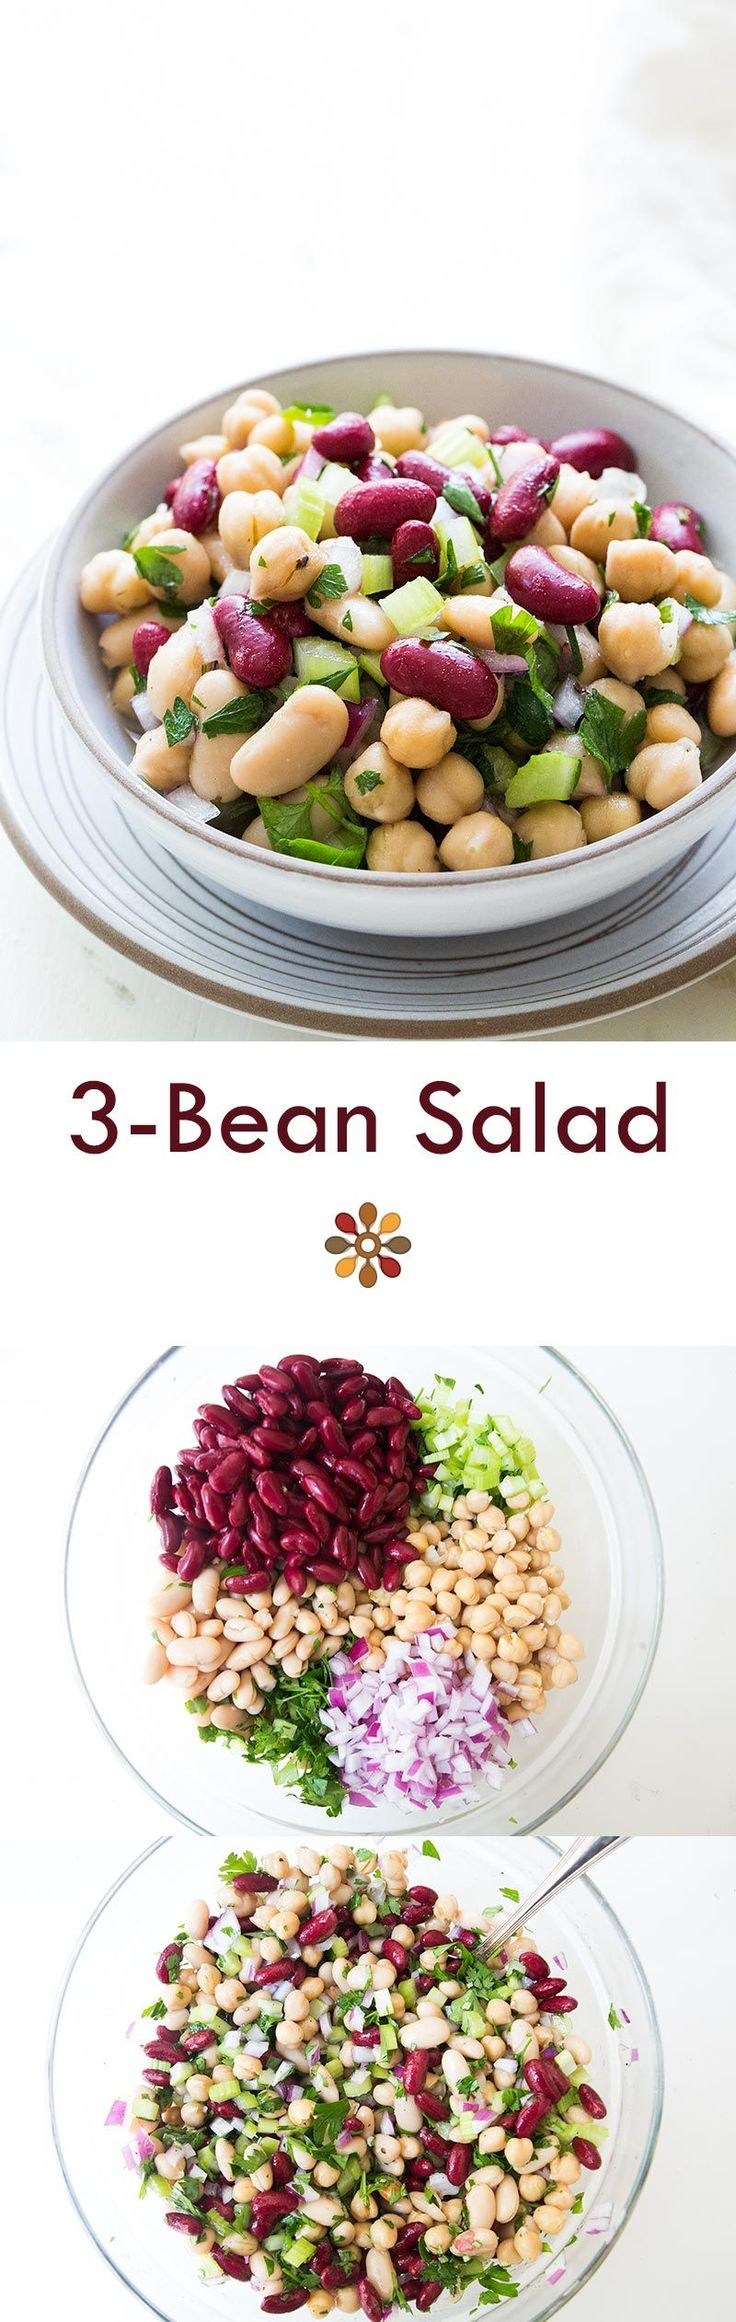 Classic American 3-bean salad, perfect for summer picnics and potlucks! On SimplyRecipes.com #vegan #glutenfree